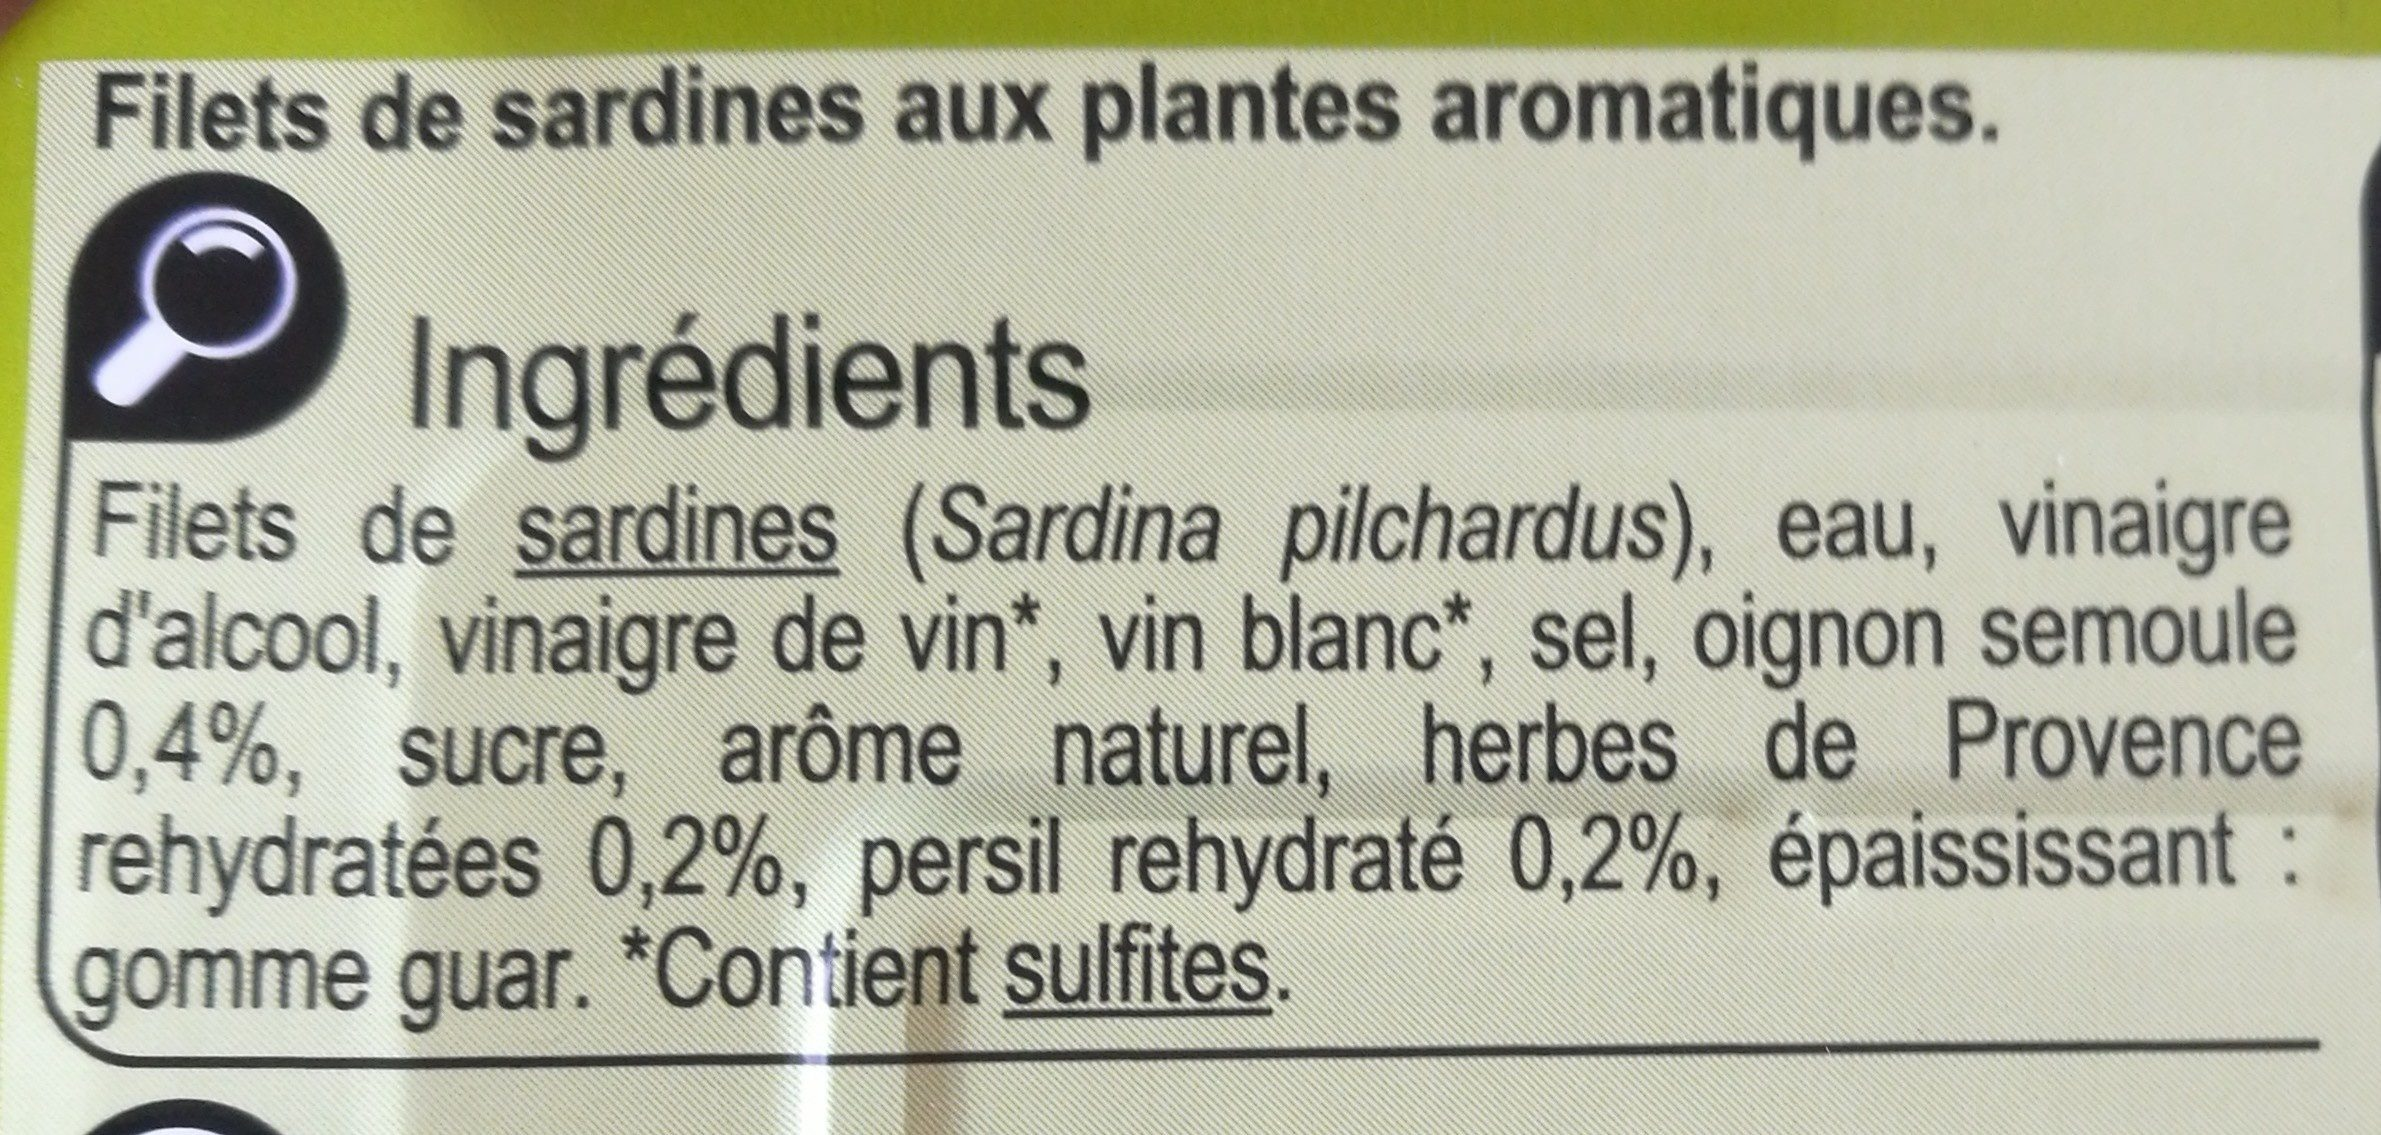 Filets de sardines (aux herbes de Provence) - Ingrediënten